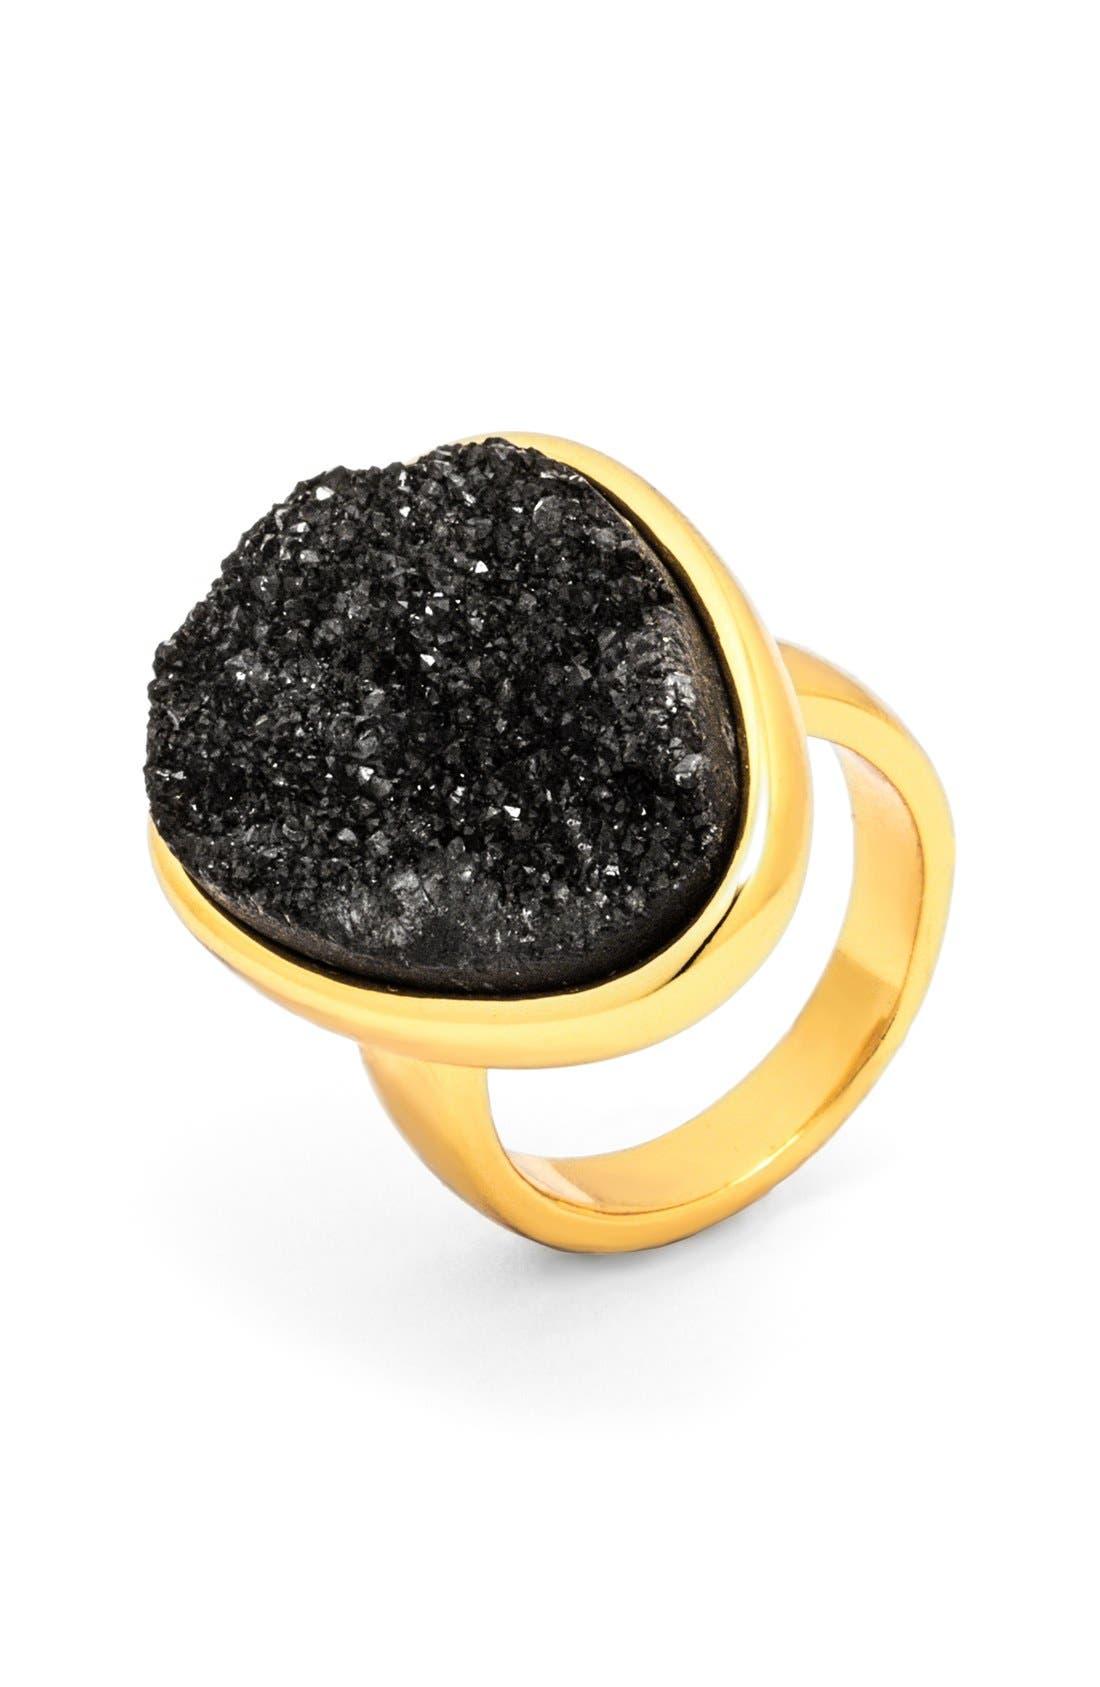 Alternate Image 1 Selected - BaubleBar Drusy Cocktail Ring